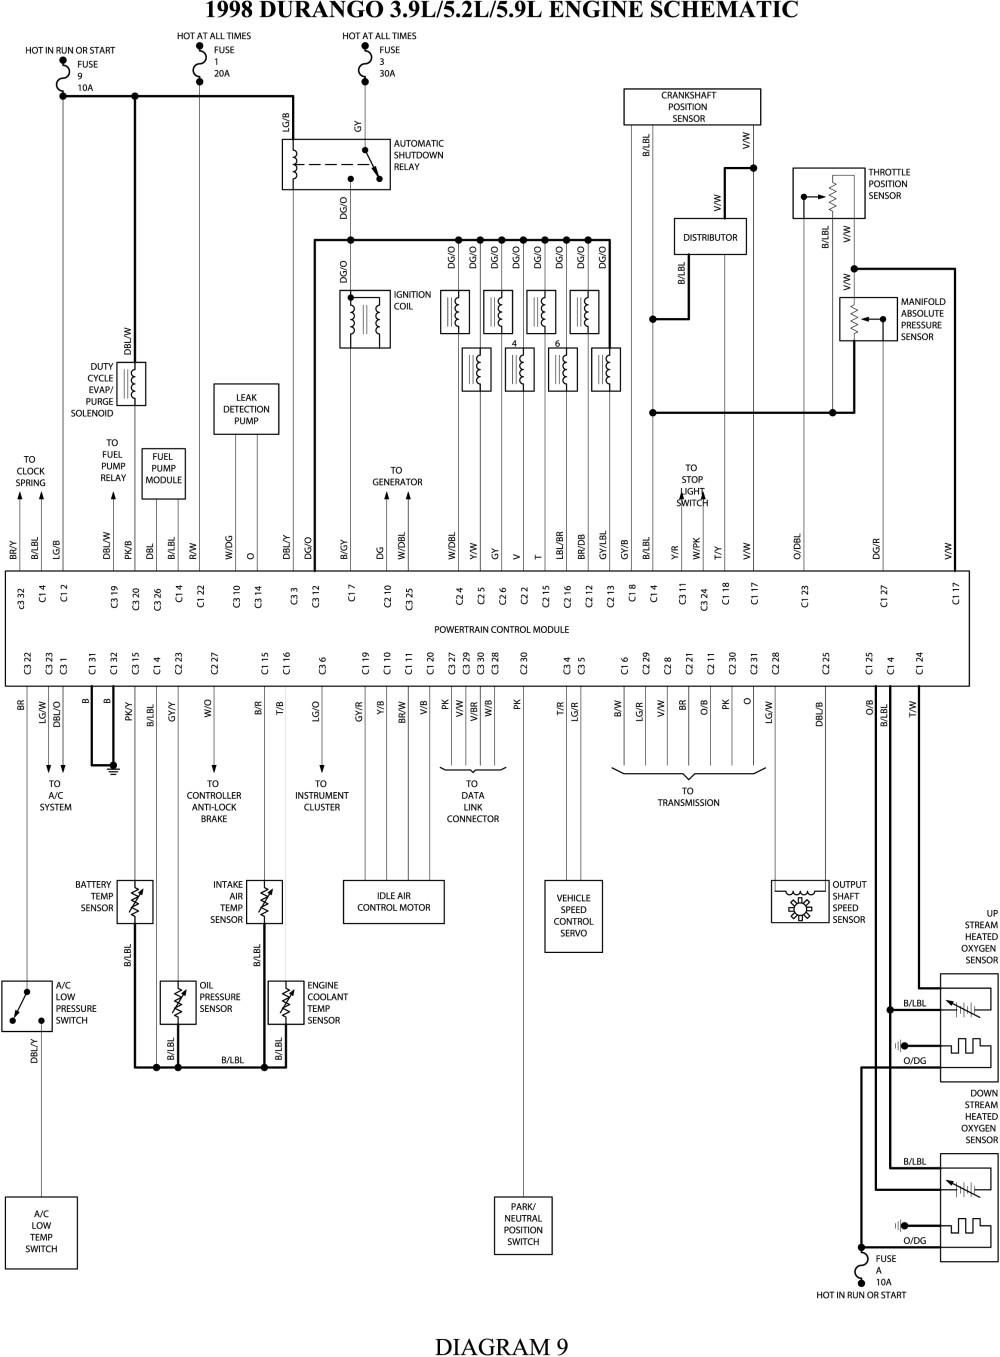 99 dodge durango wiring diagram download wiring diagram s le rh faceitsalon 2004 dodge durango trailer wiring harness 2001 dodge durango trailer